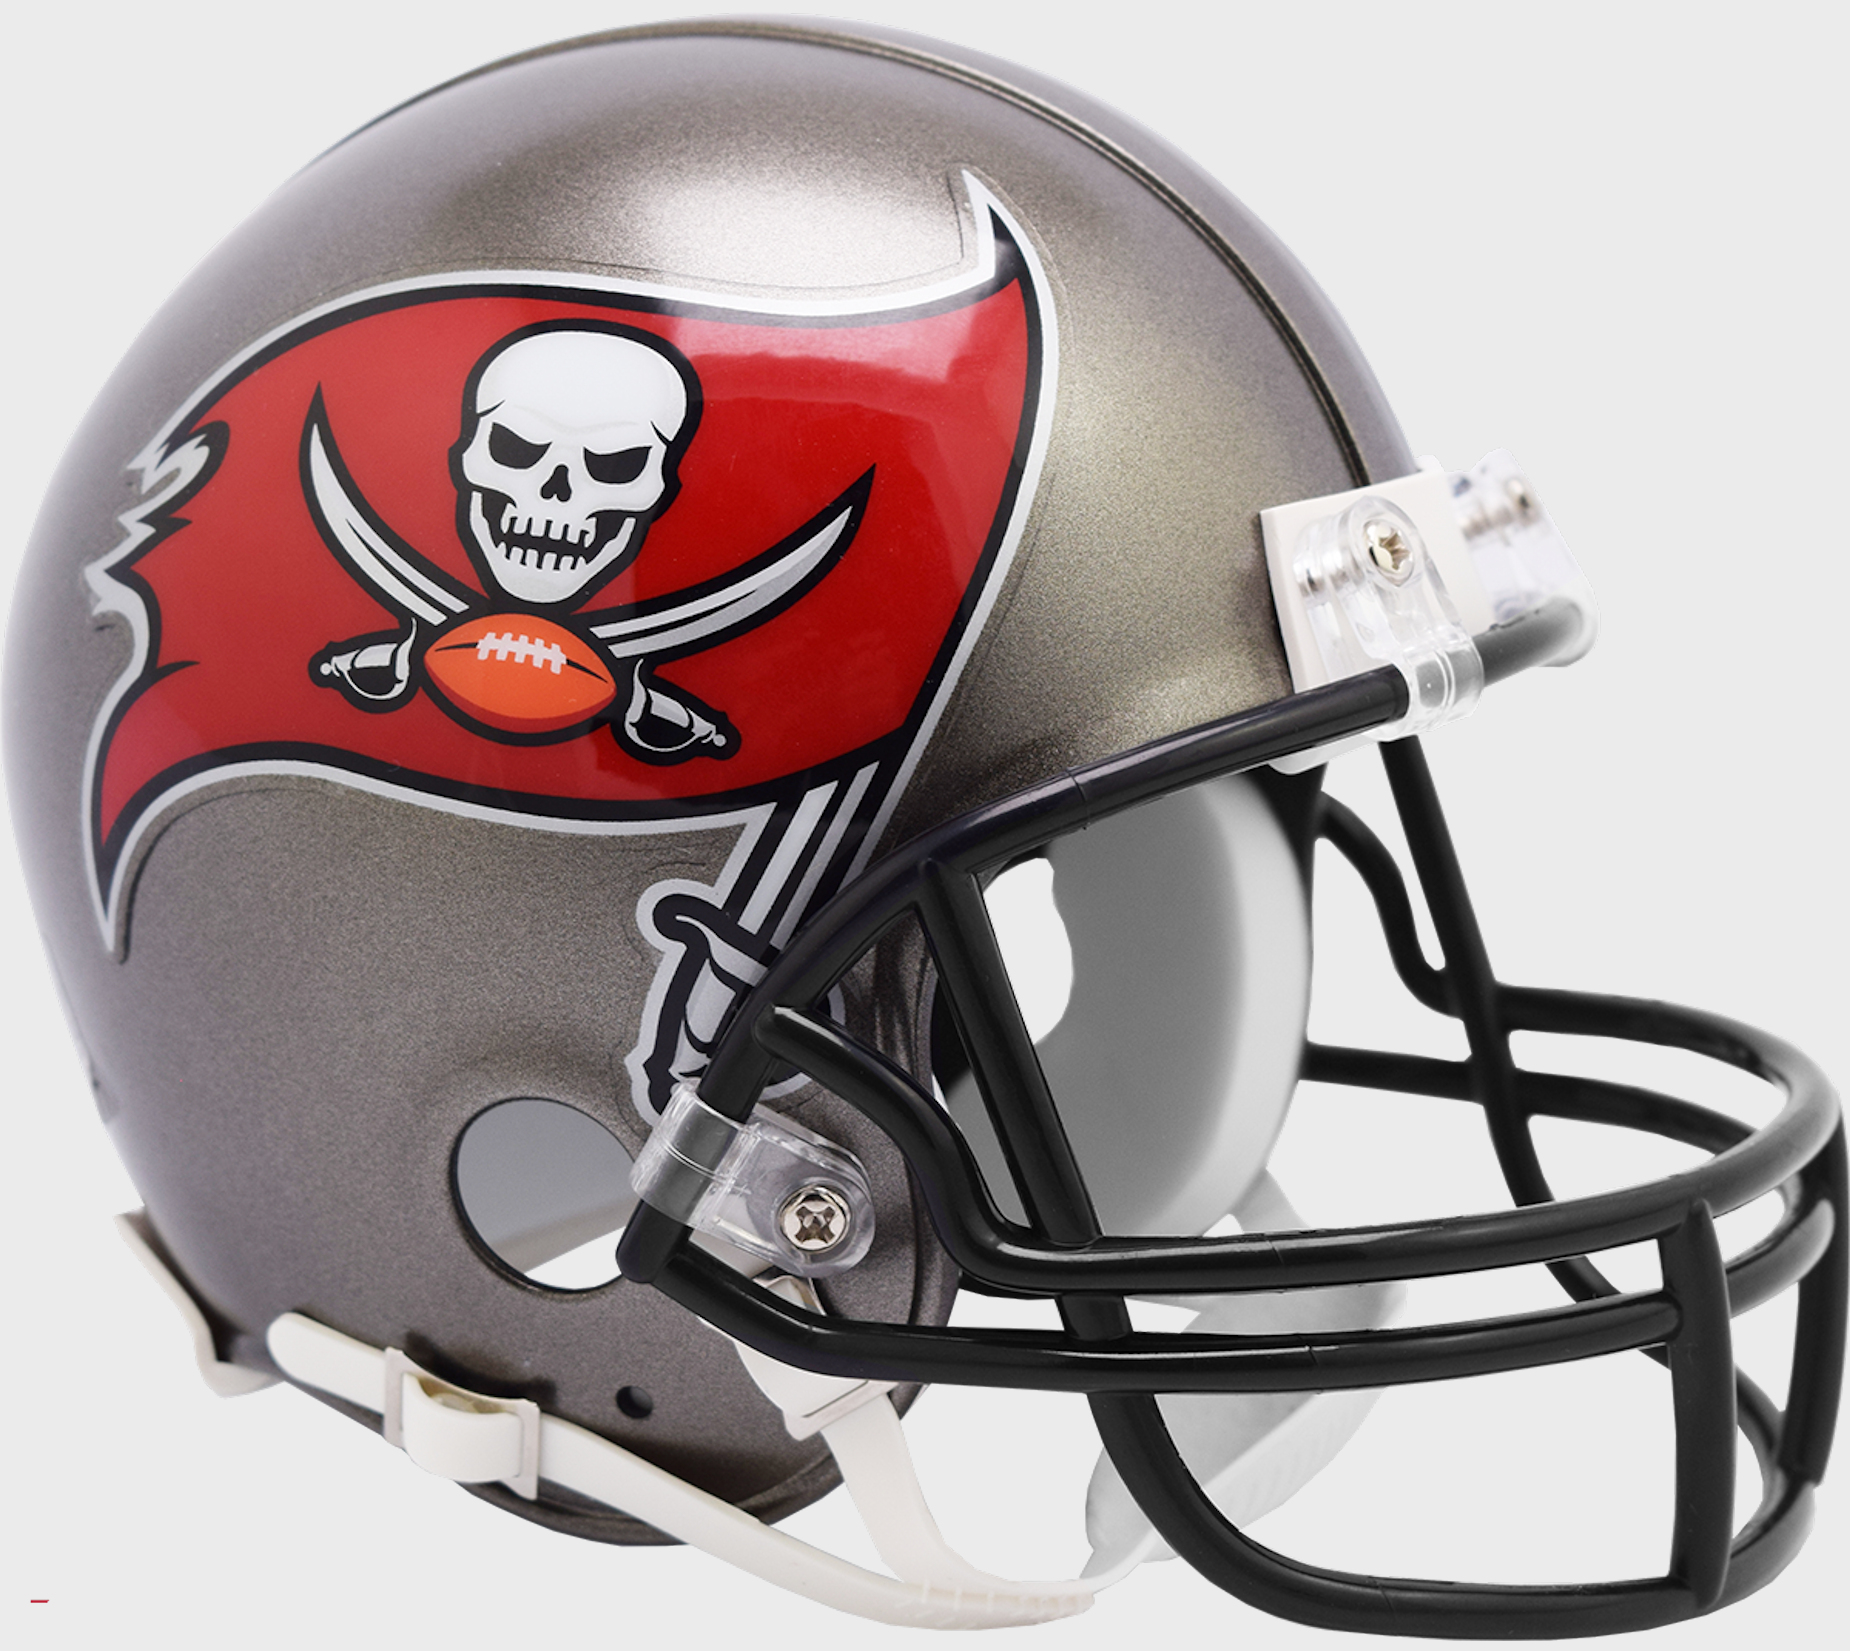 Tampa Bay Buccaneers NFL Mini Football Helmet